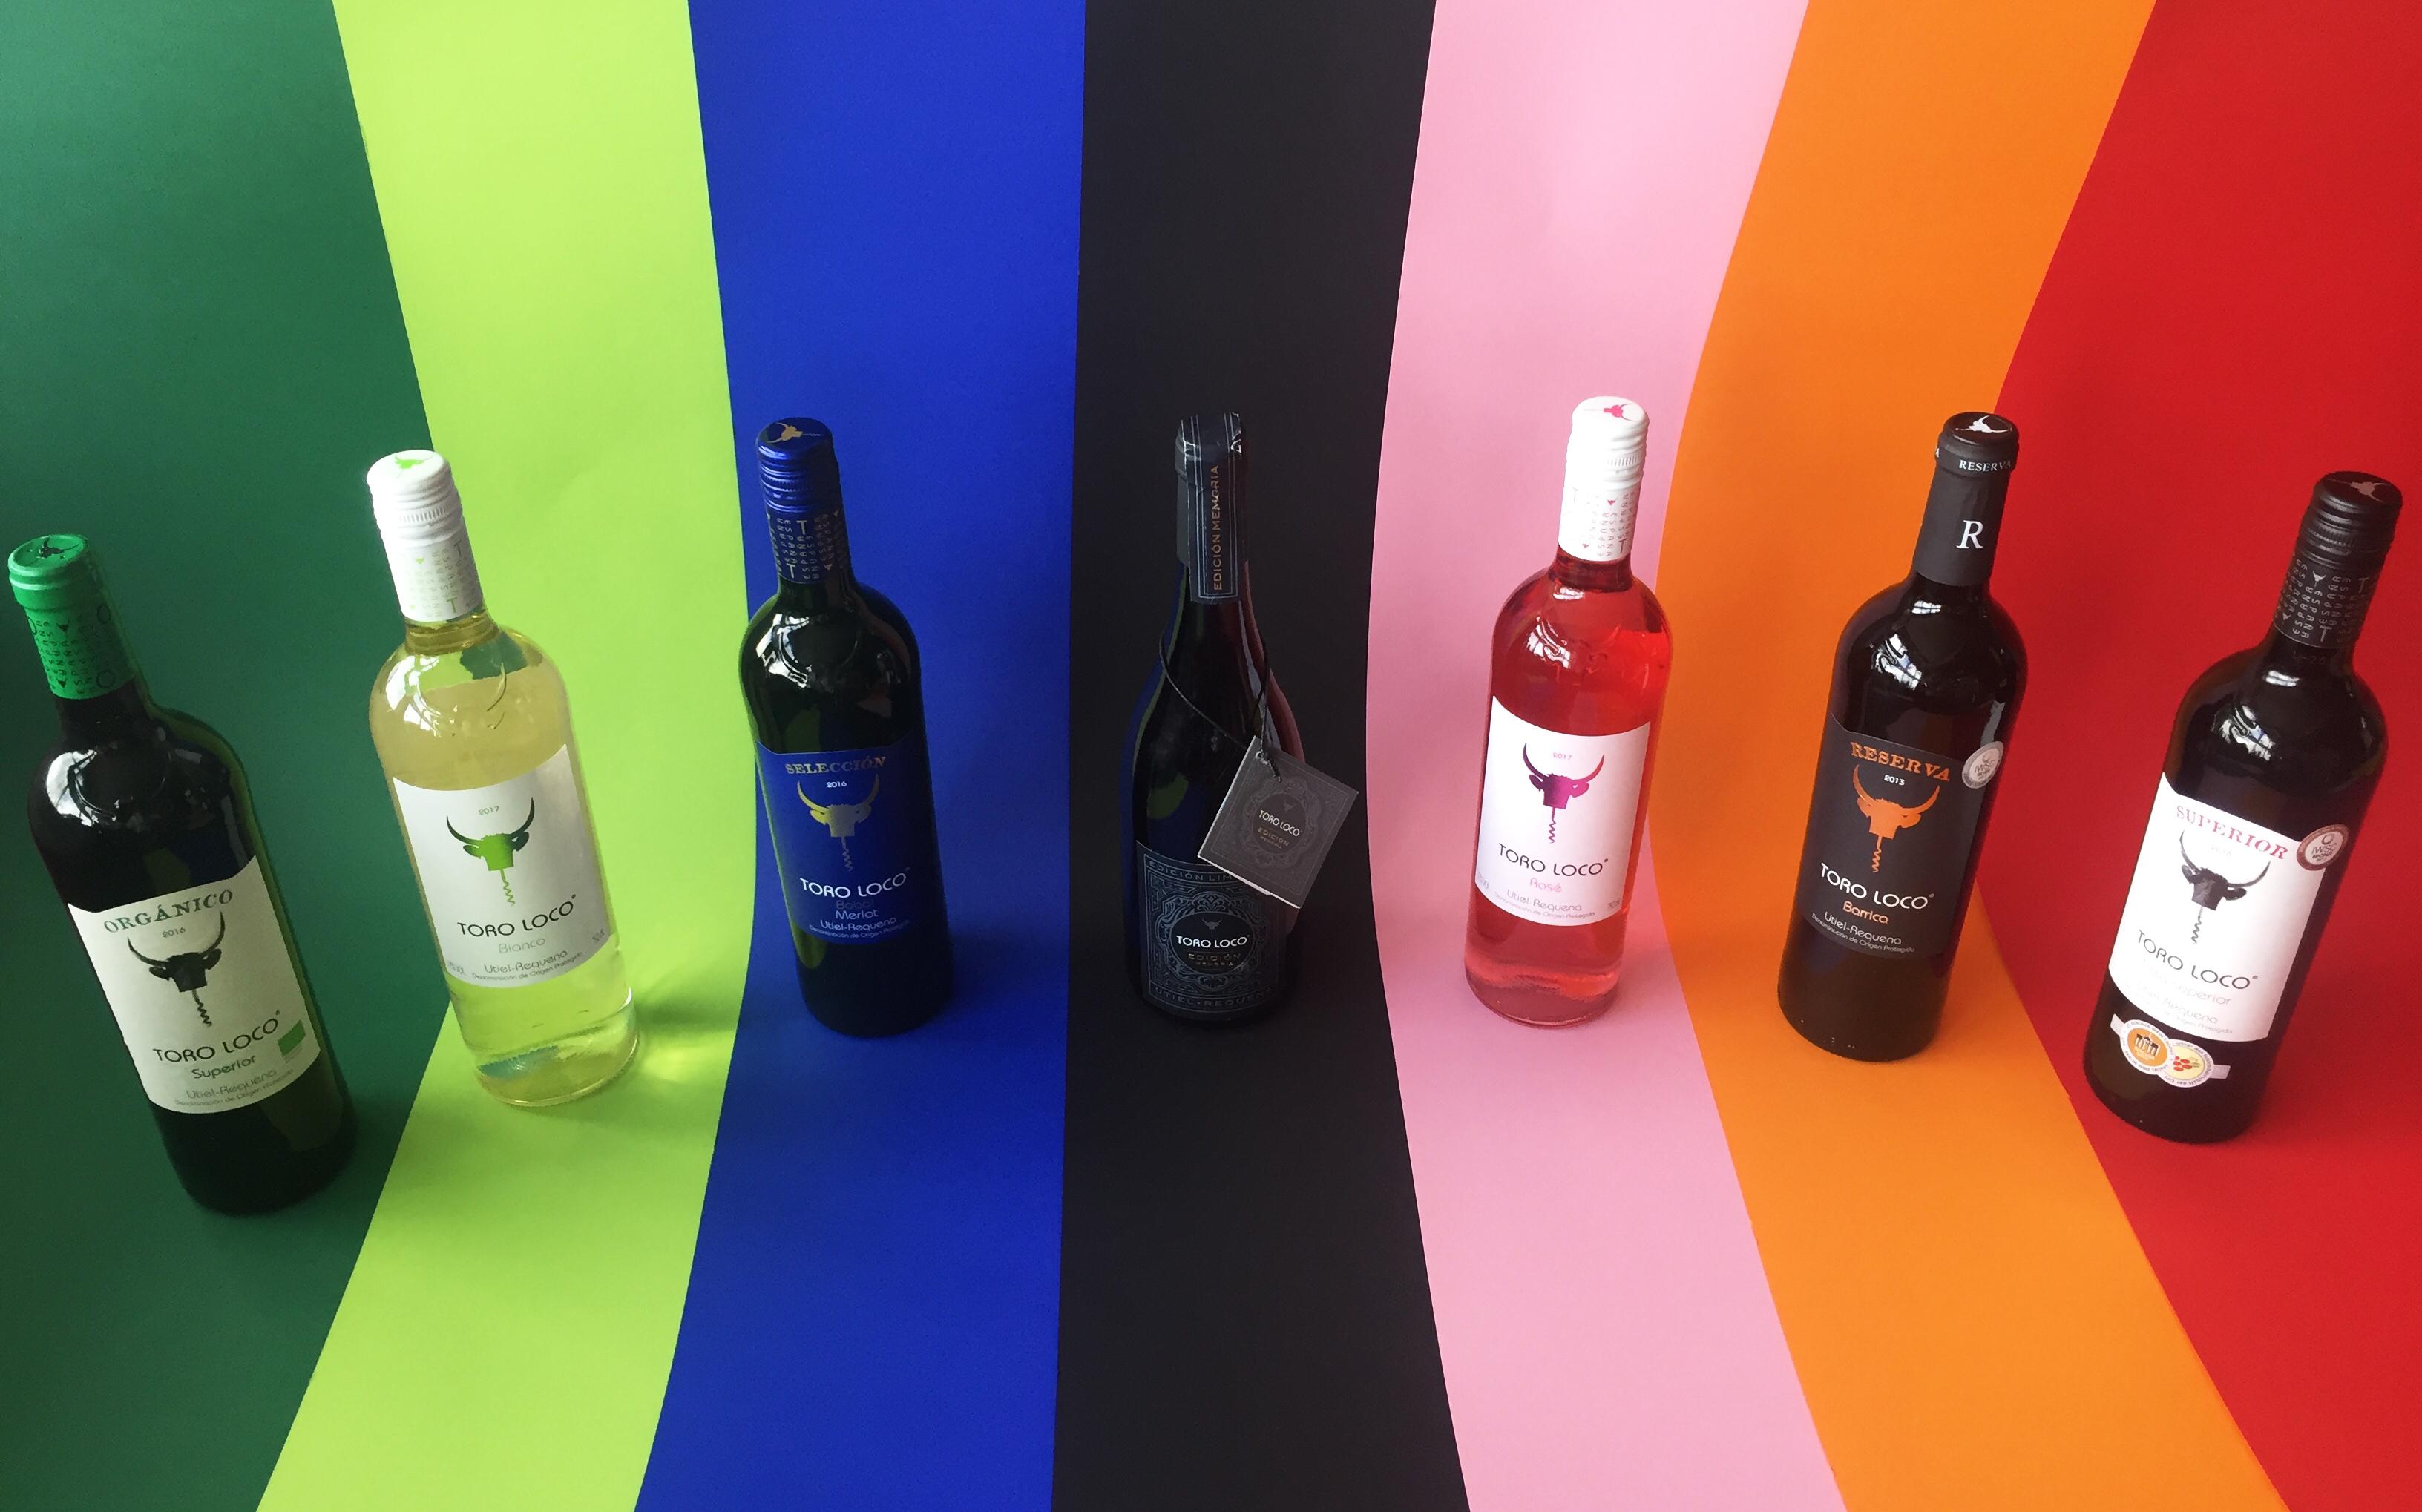 benoit-valerie-calvet-toro-loco-wine-colors-01